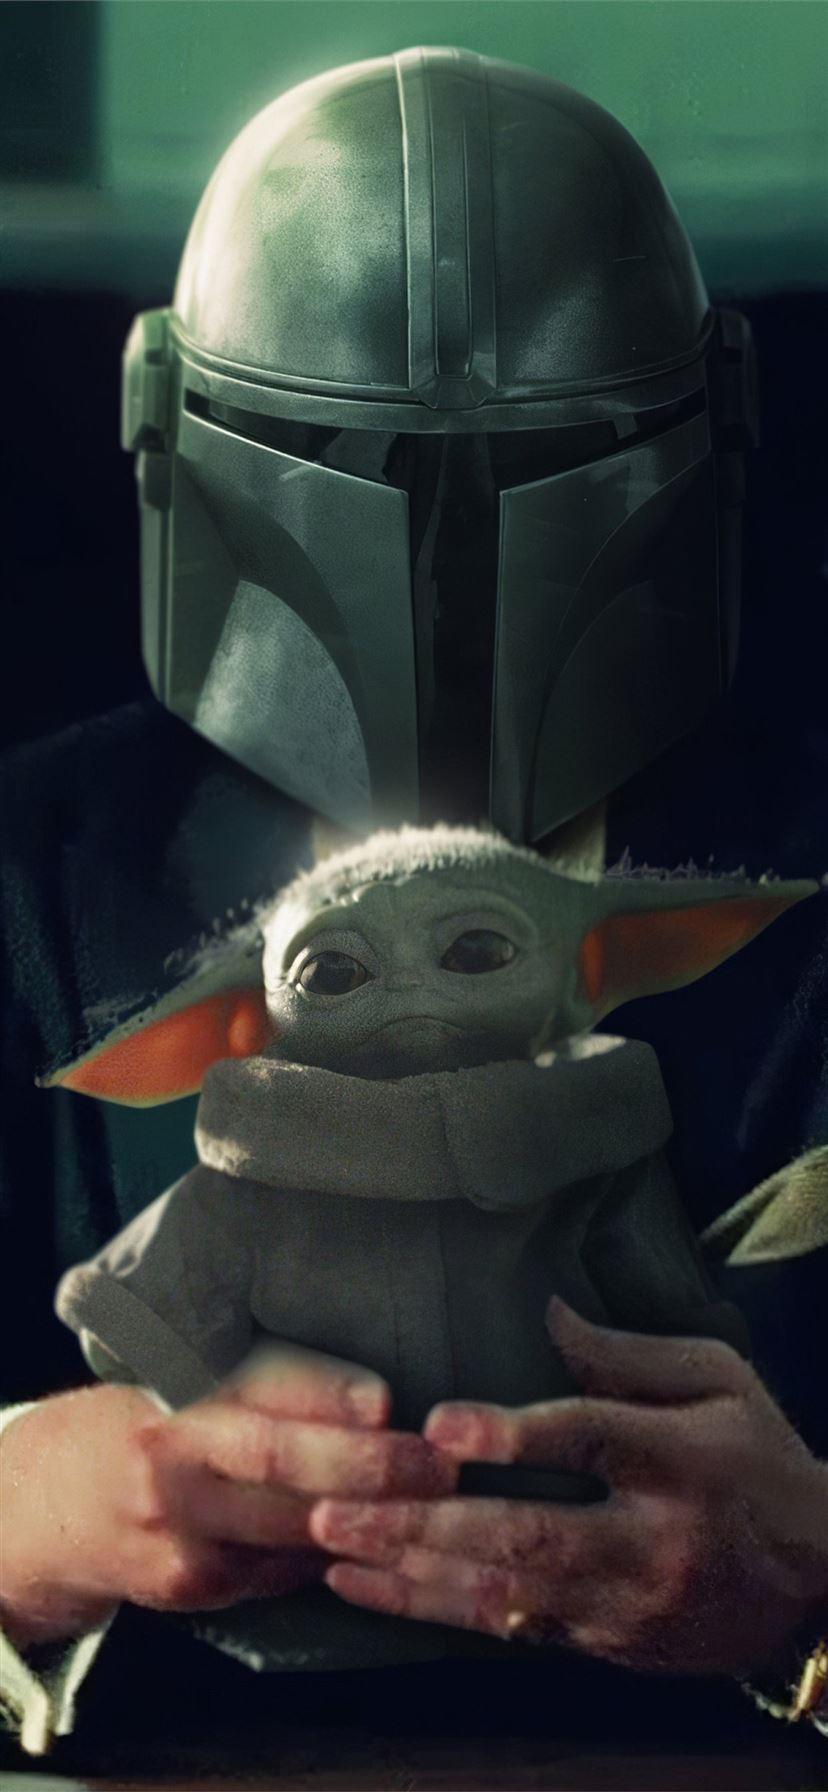 The Mandalorian Yoda 4k Iphone 11 Wallpapers Free Download